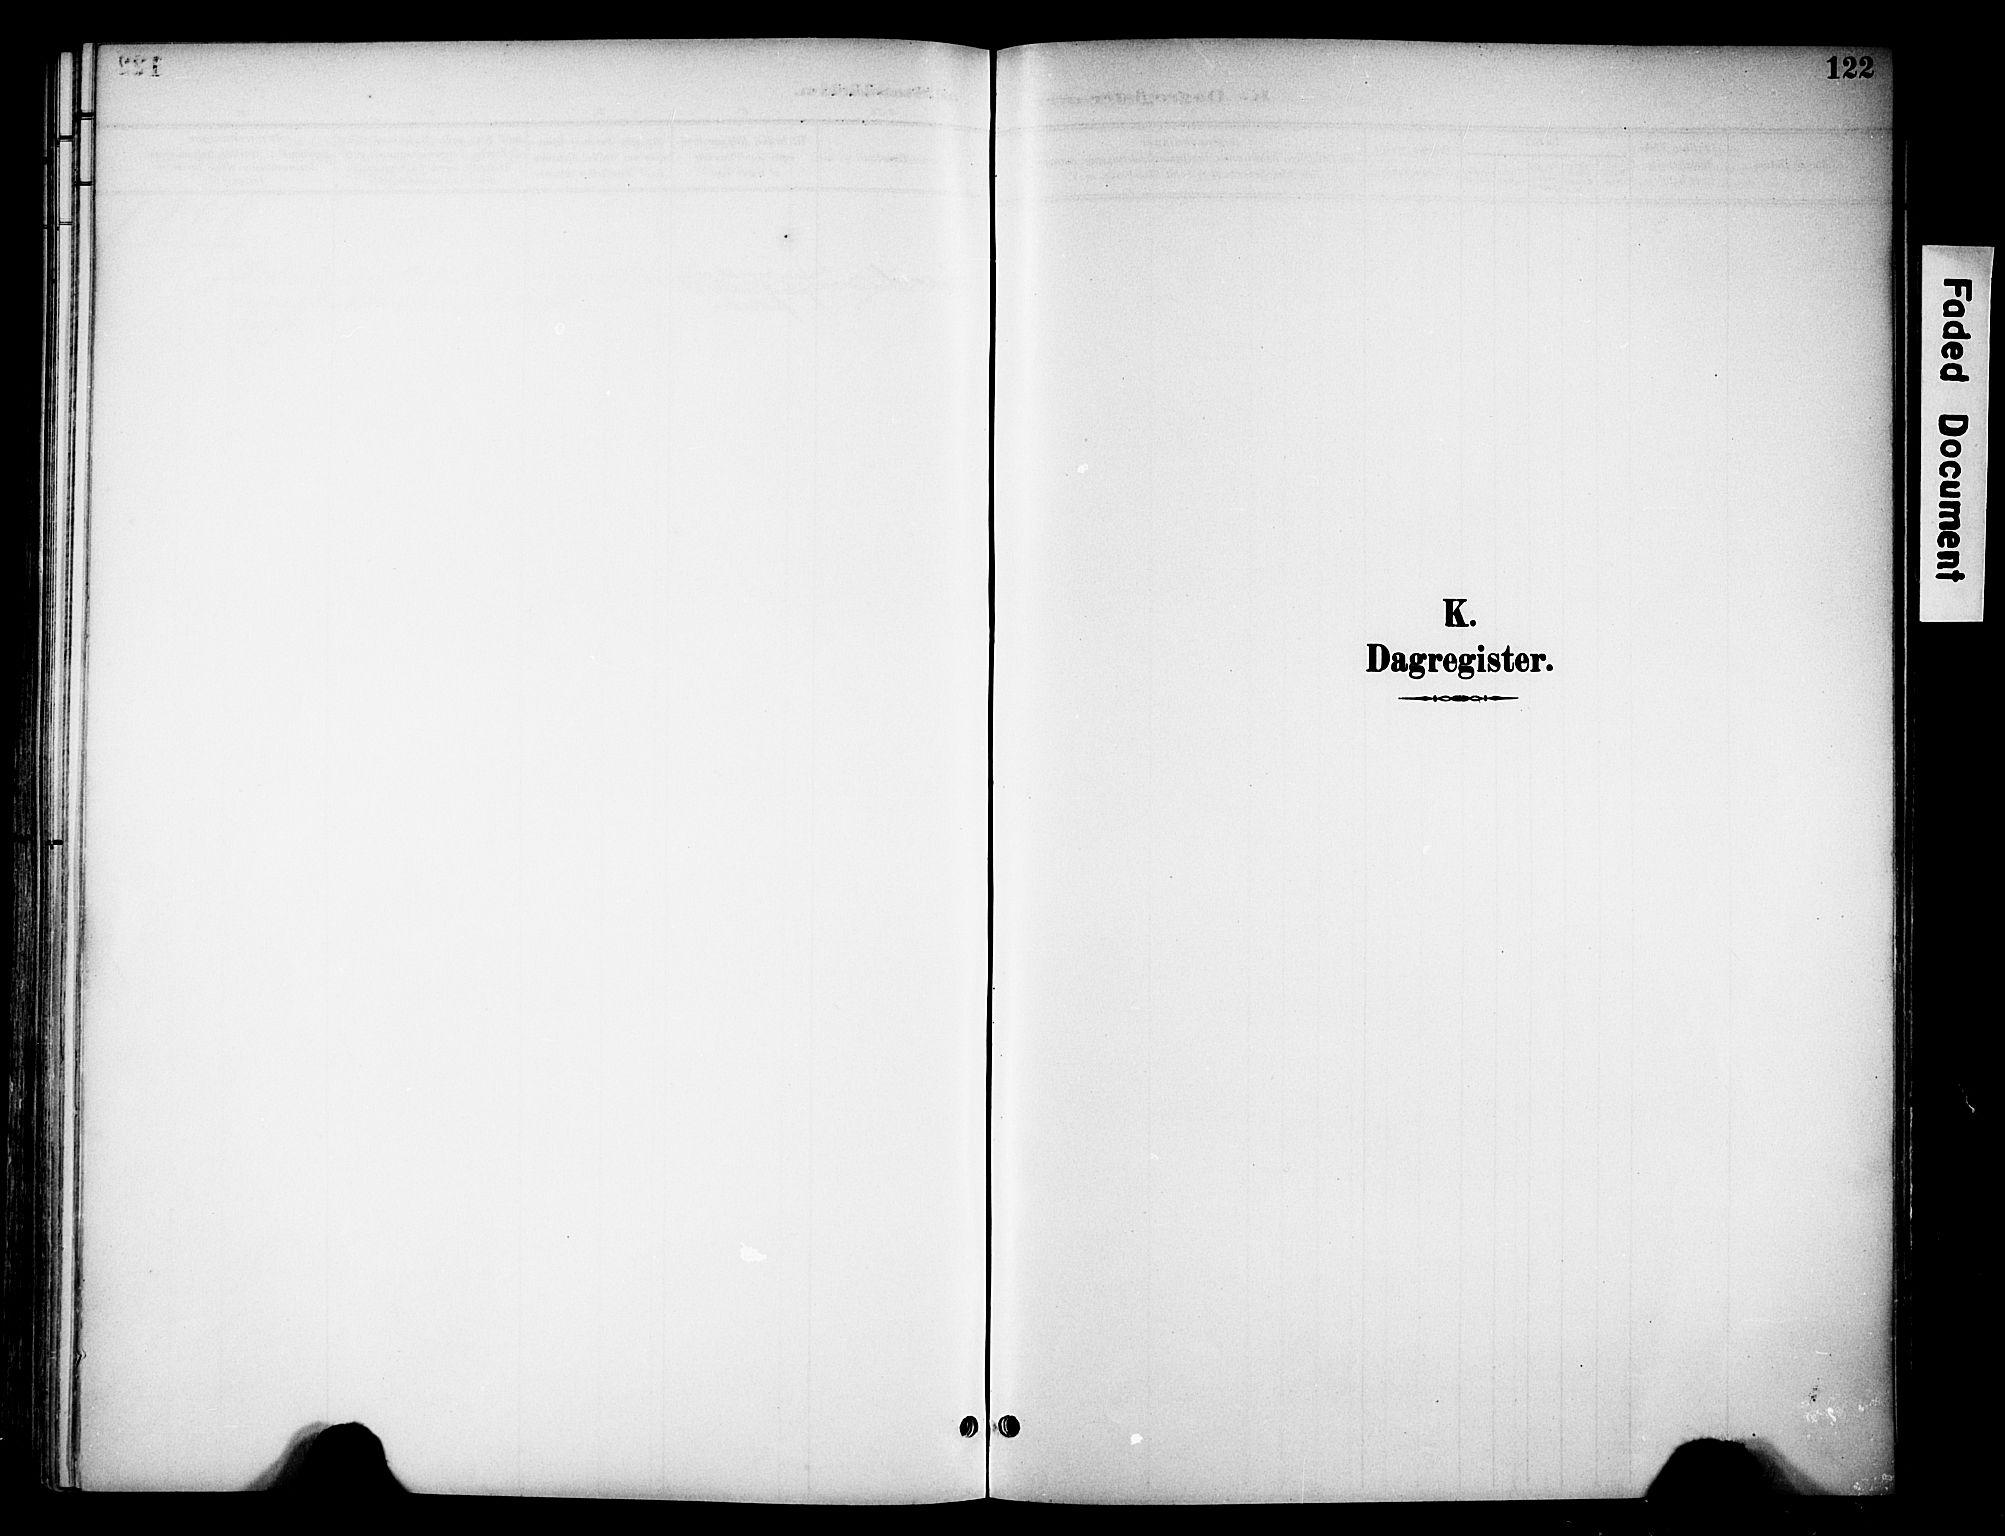 SAH, Biri prestekontor, Ministerialbok nr. 8, 1894-1901, s. 122